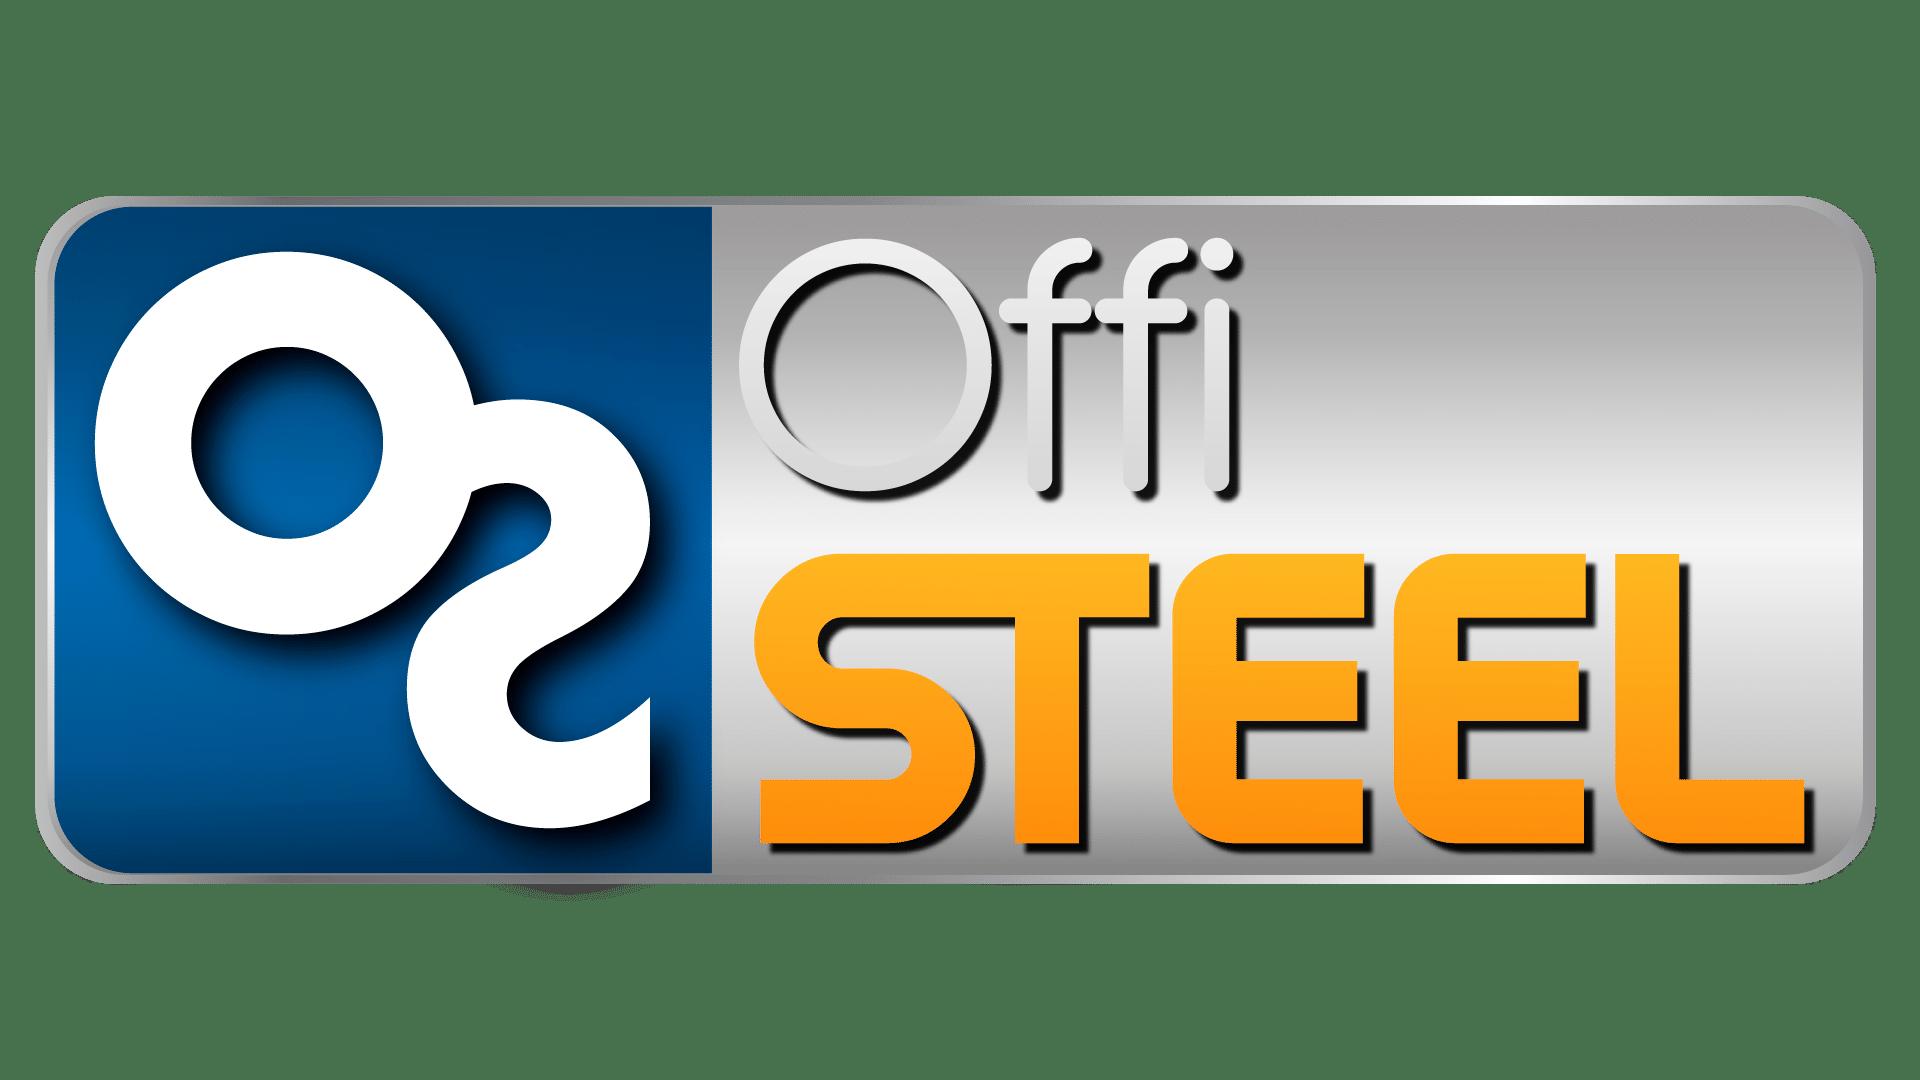 OFFI STEEL